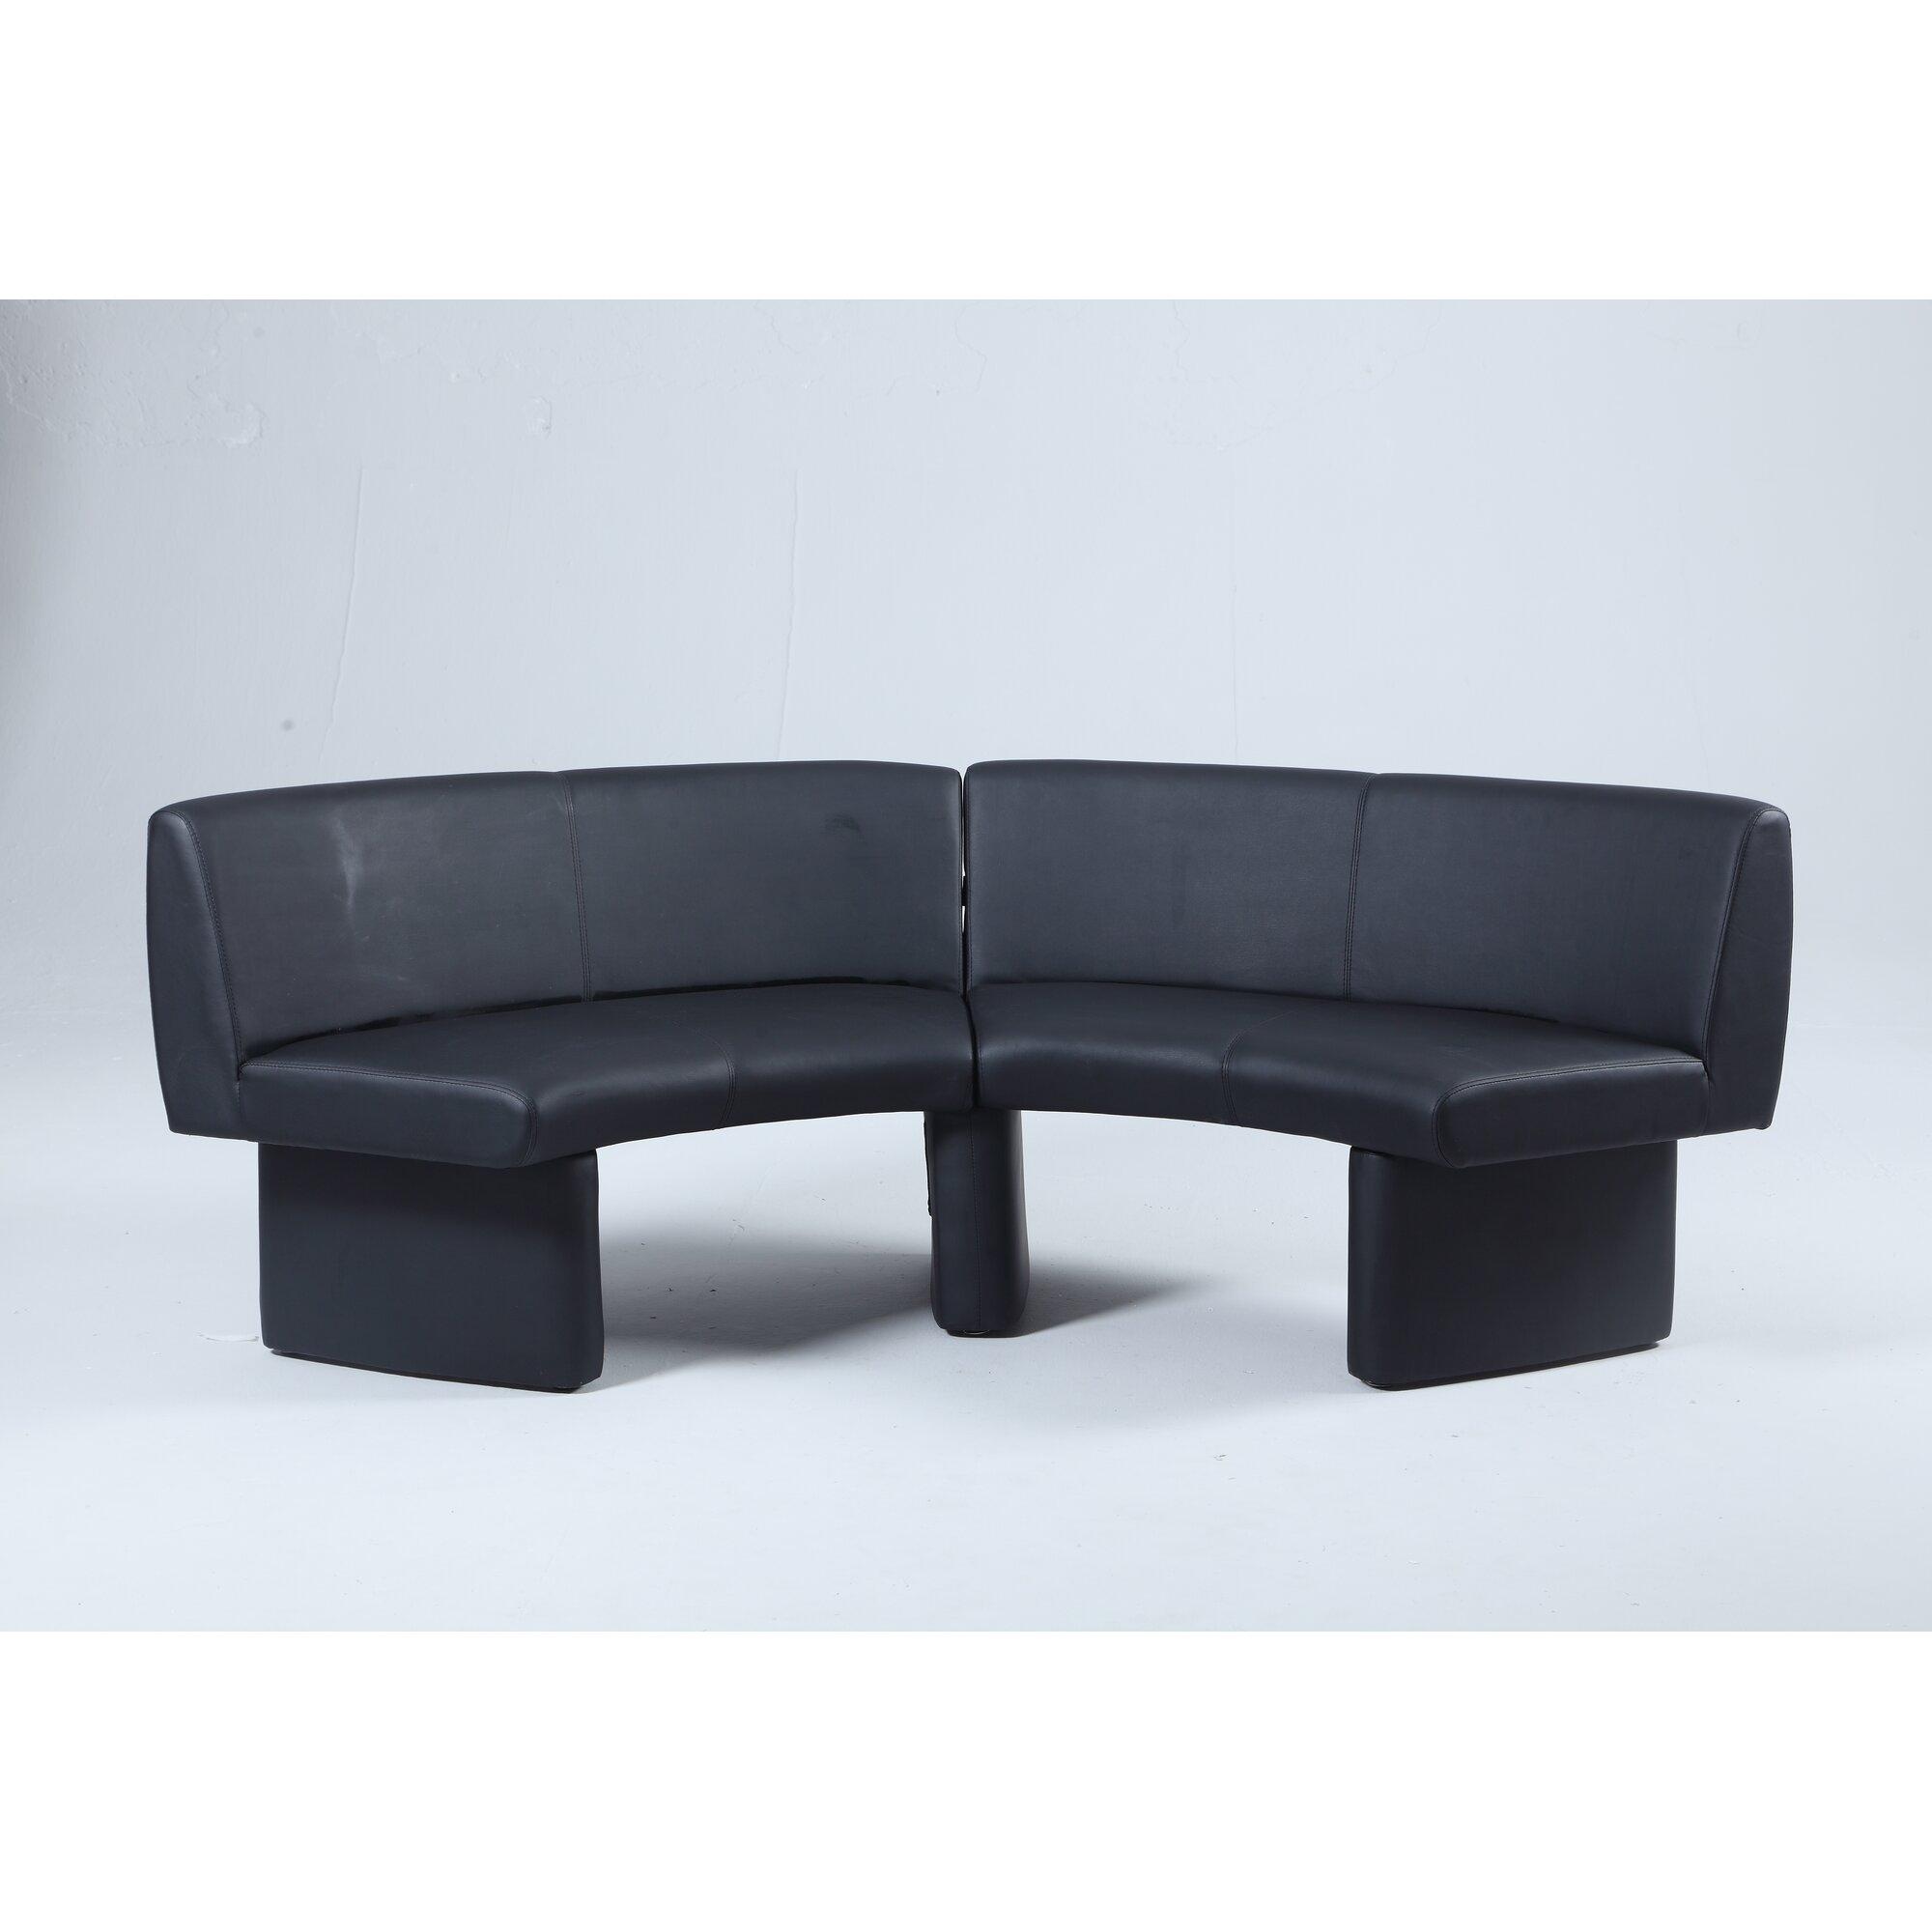 Beau Jaxx Upholstered Dining Bench